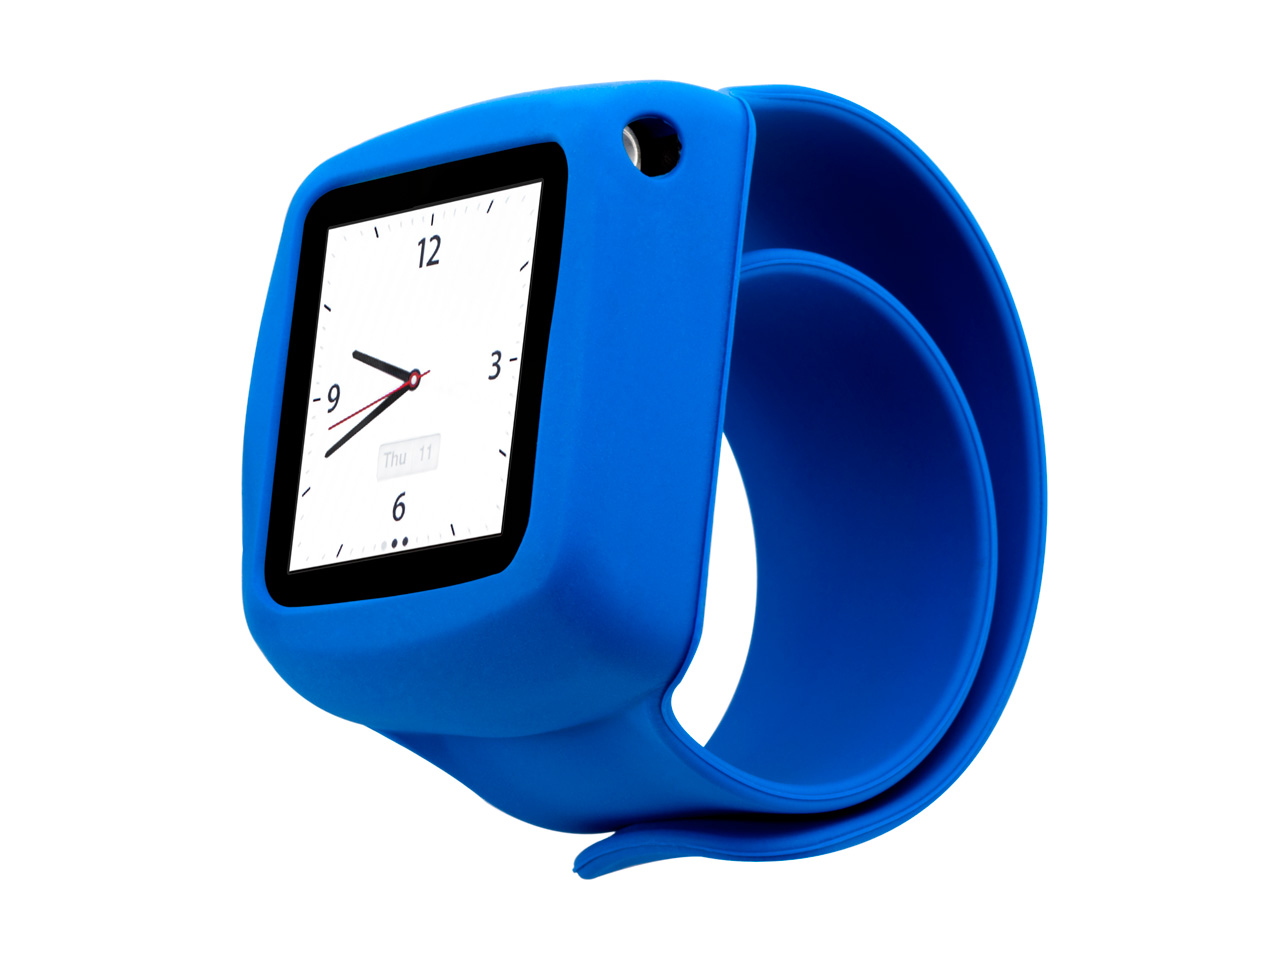 Blue Slap Bracelet Case for iPod nano (6th gen.)